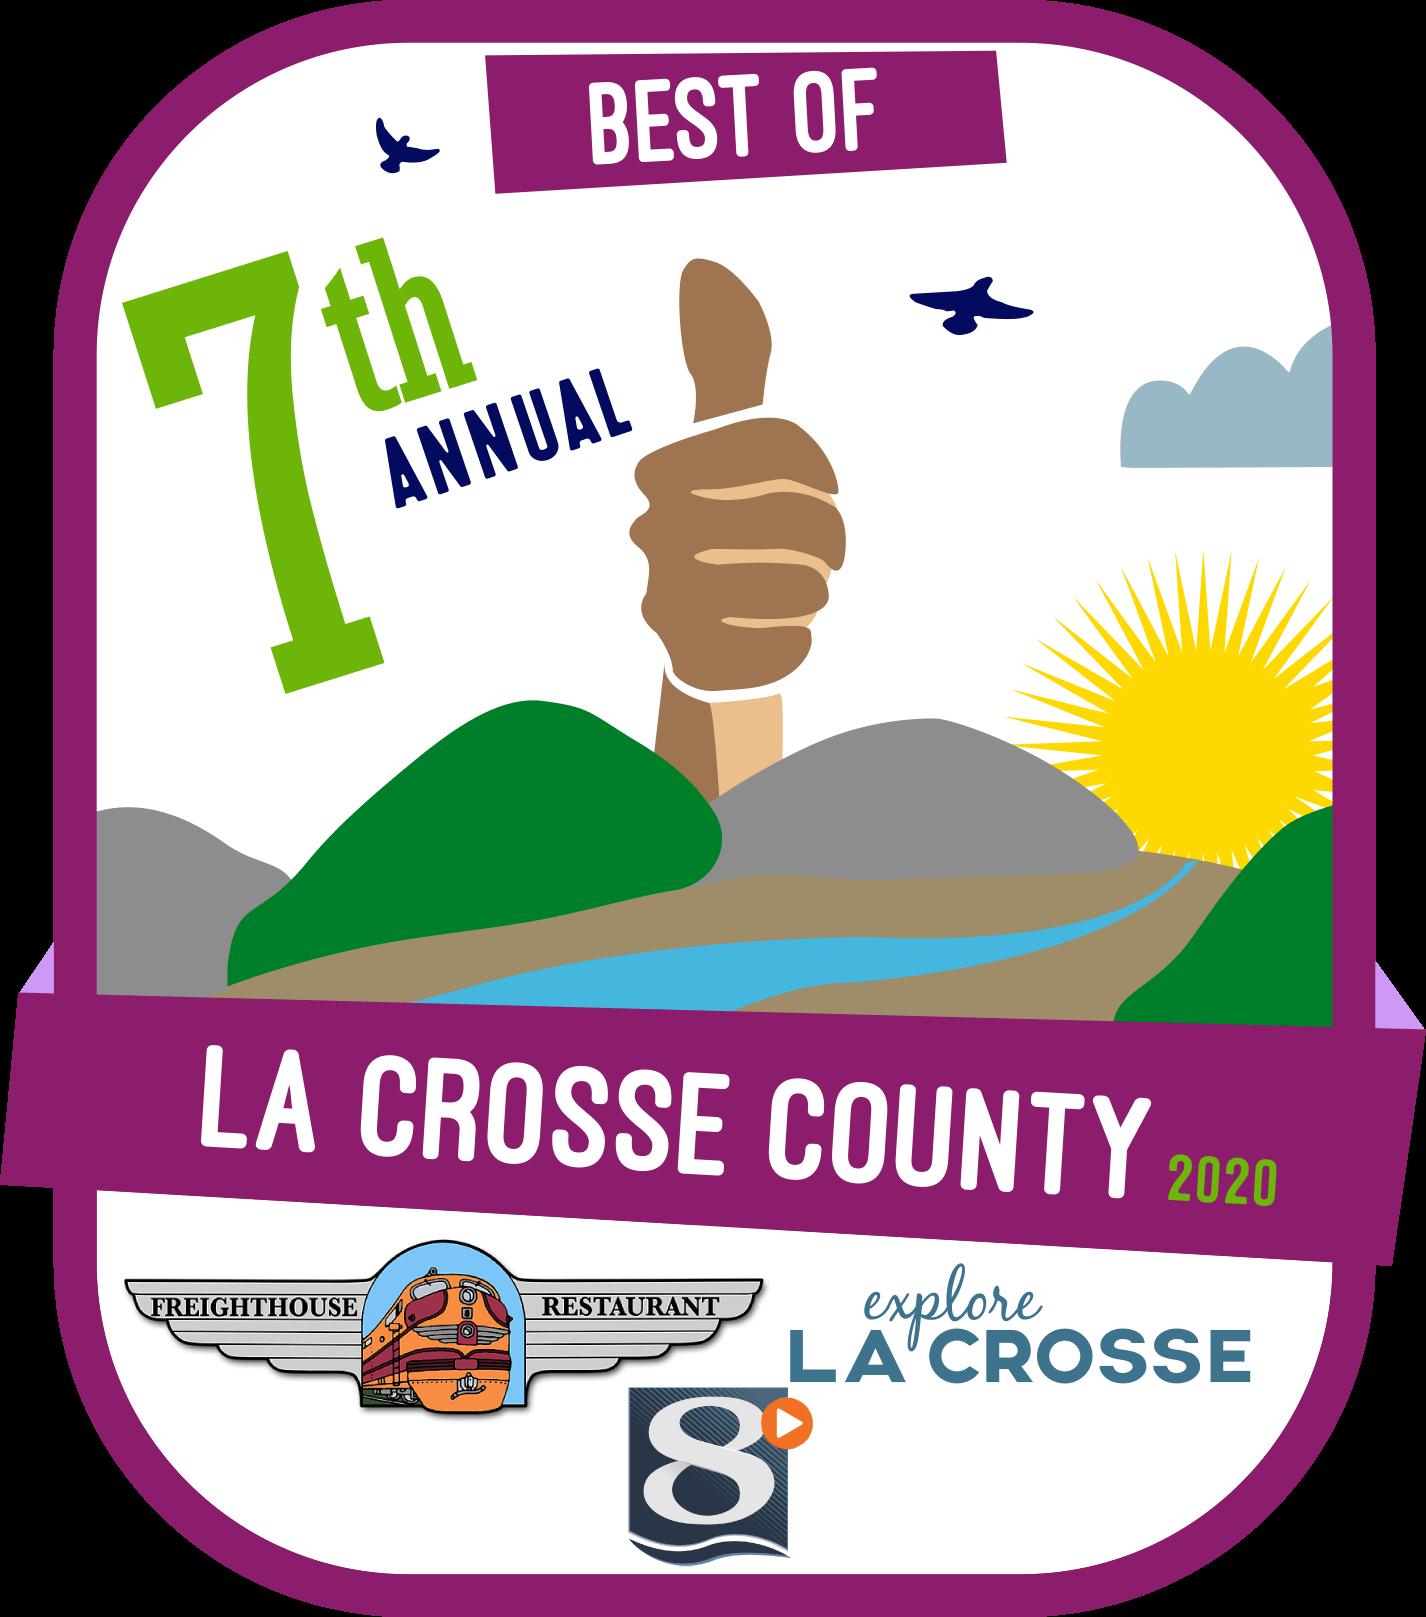 Best of La Crosse County Badge 2020